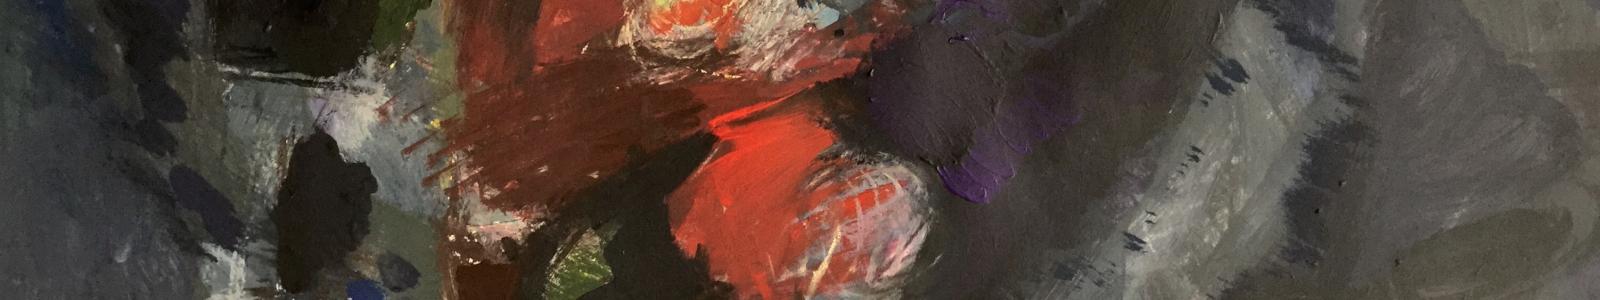 Gallery Painter Aram Simonyan